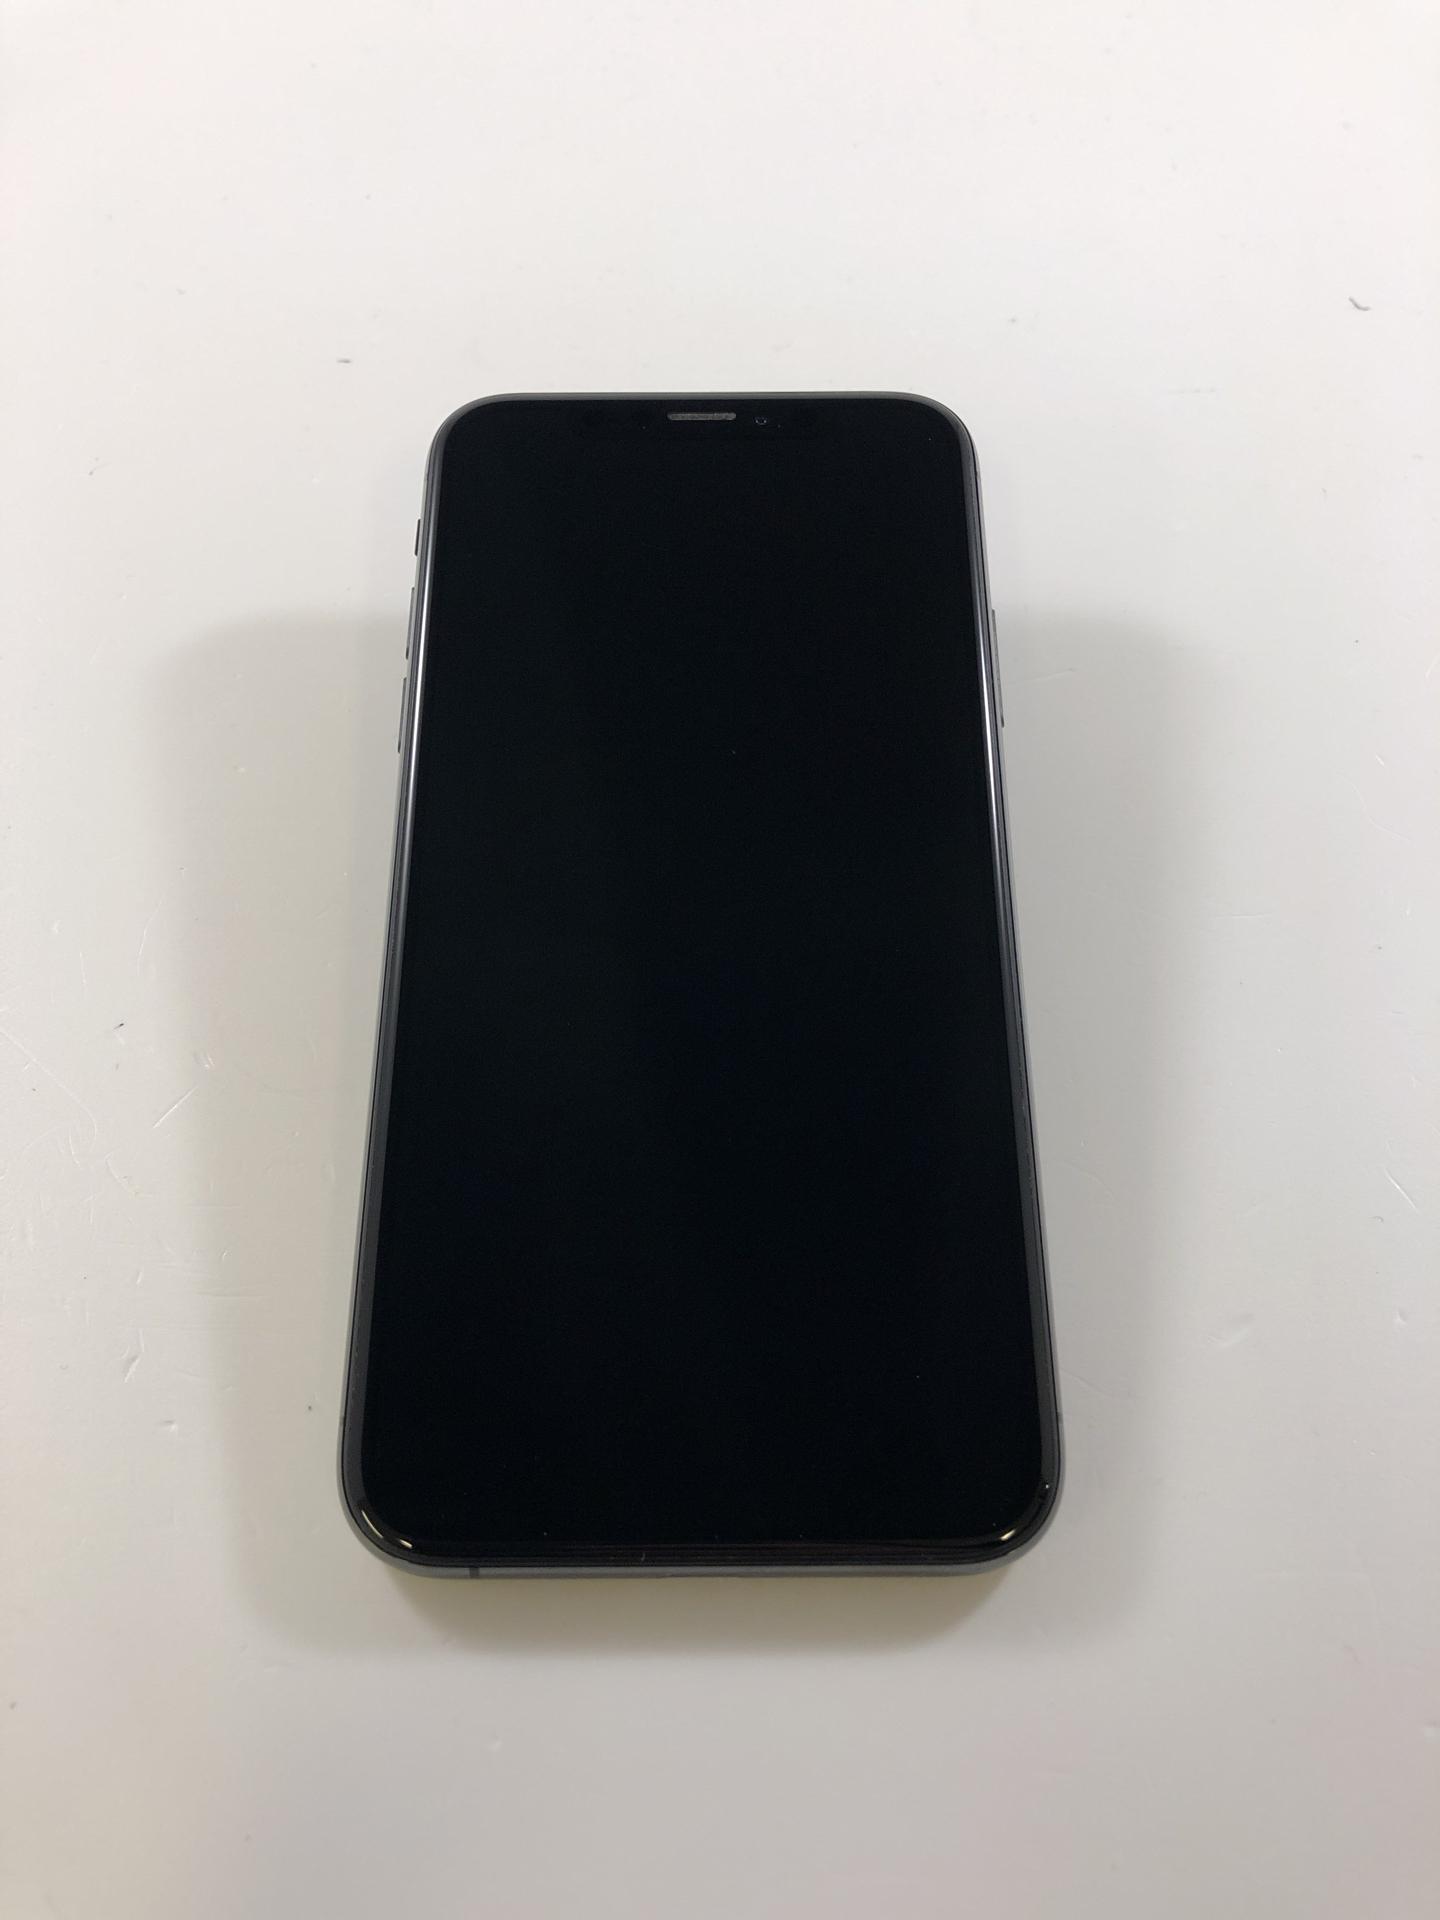 iPhone XS 256GB, 256GB, Space Gray, Afbeelding 1